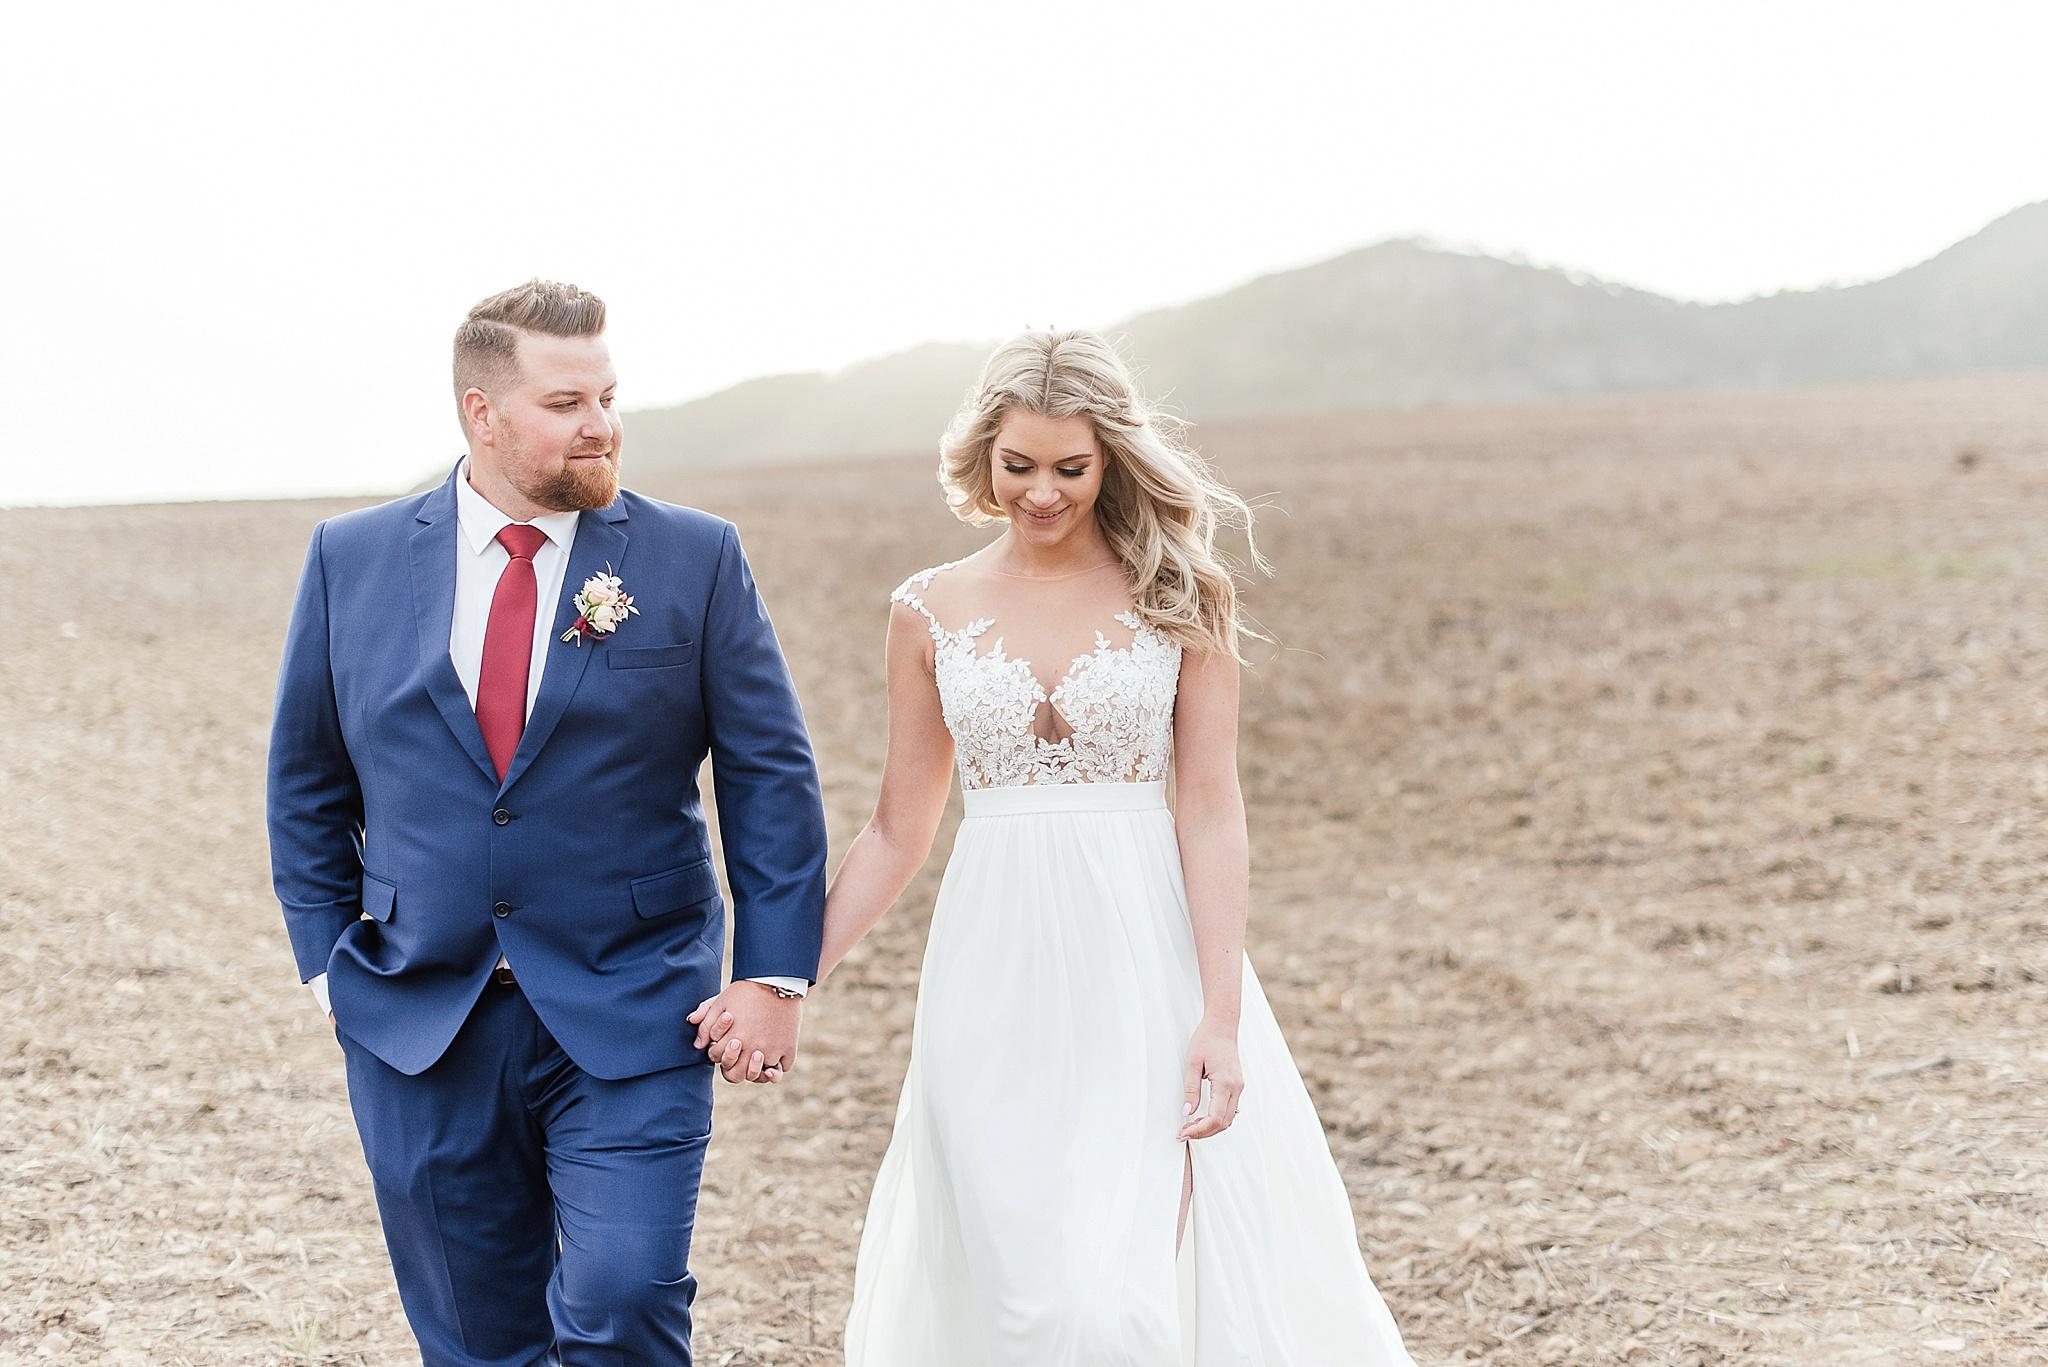 Cape Town Photographer Darren Bester - Die Woud Wedding - Gareth & Roxanne_0036.jpg